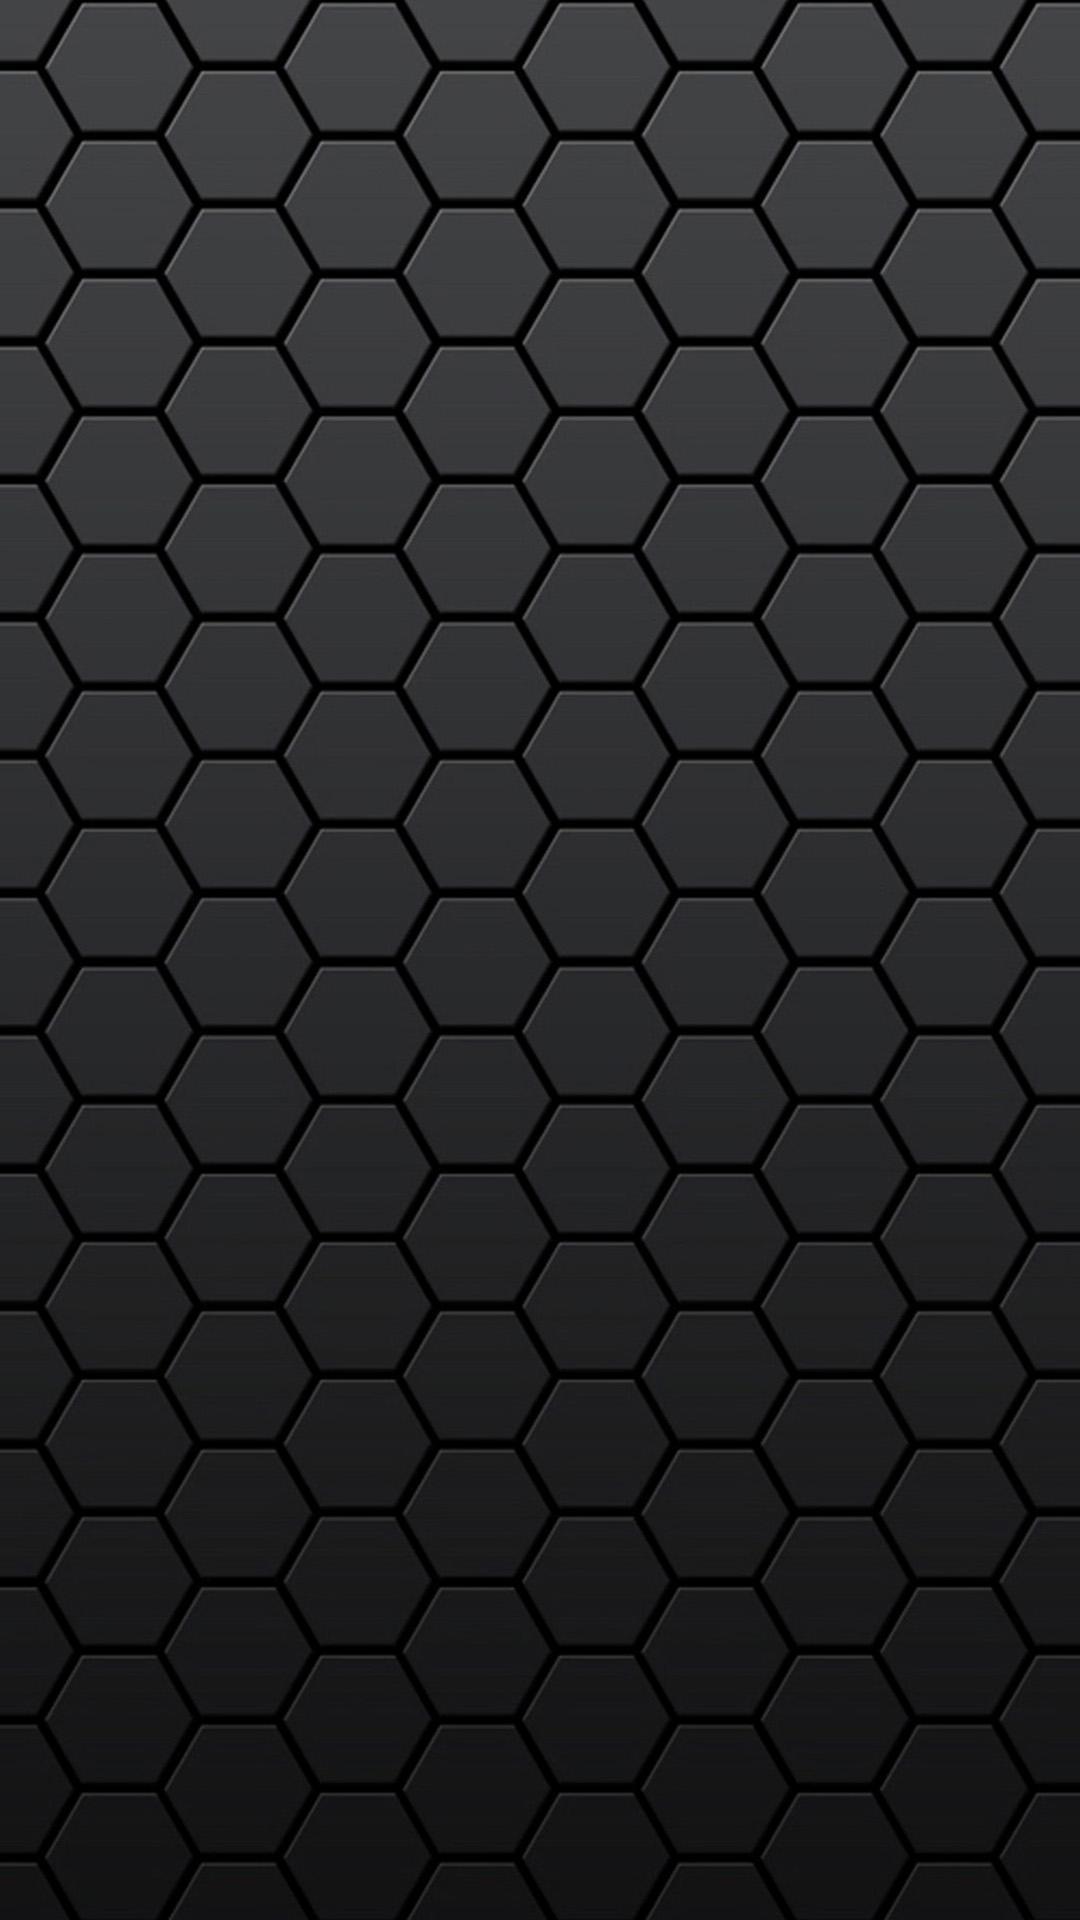 wallpaper.wiki-Carbon-Fiber-iPhone-Wallpaper-Widescreen-PIC-